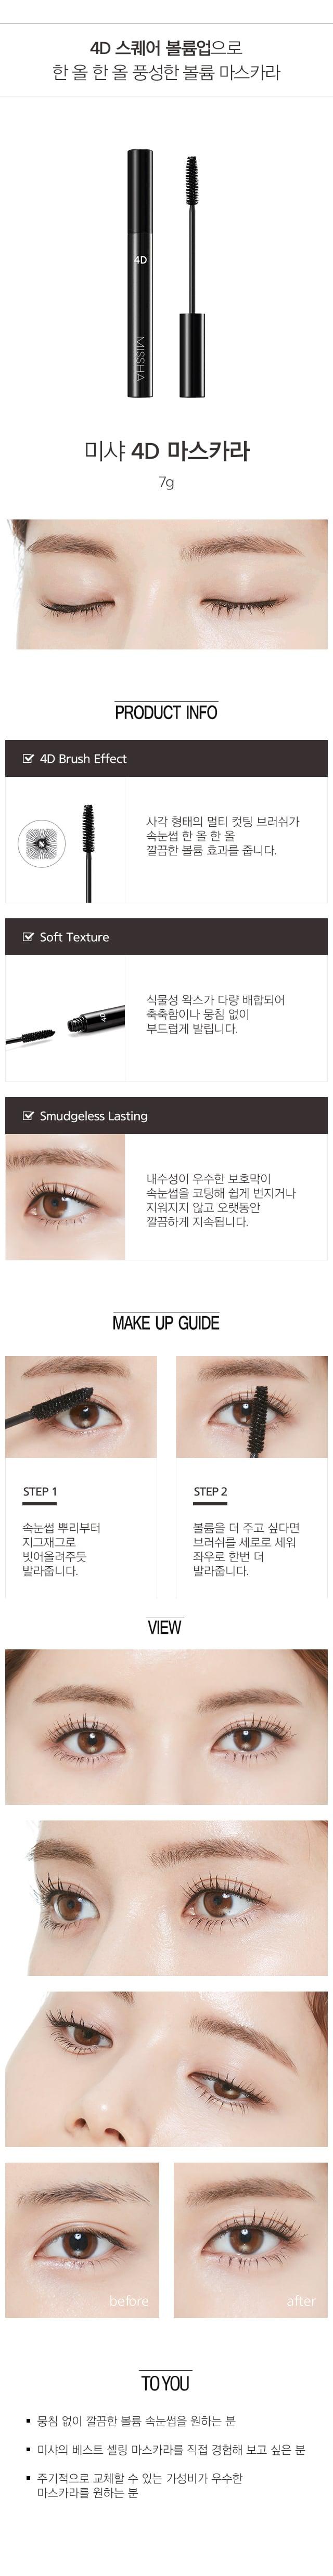 Missha 4D Mascara 7g info - فروشگاه اینترنتی می شاپ